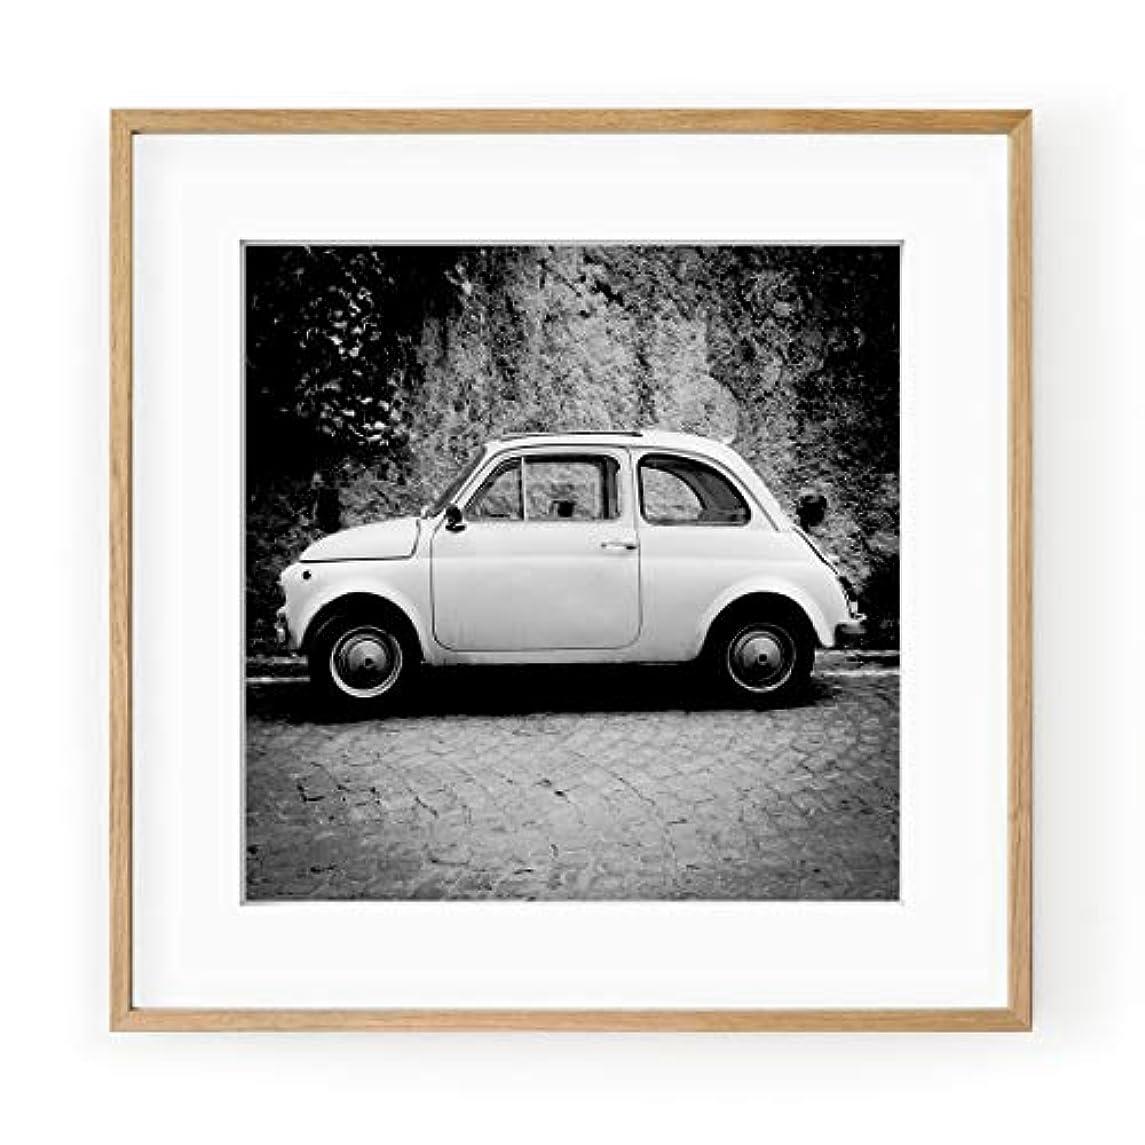 Fiat 500 Black and White Satin Black Aluminium Frame with Mount, Multicolored, 50x50